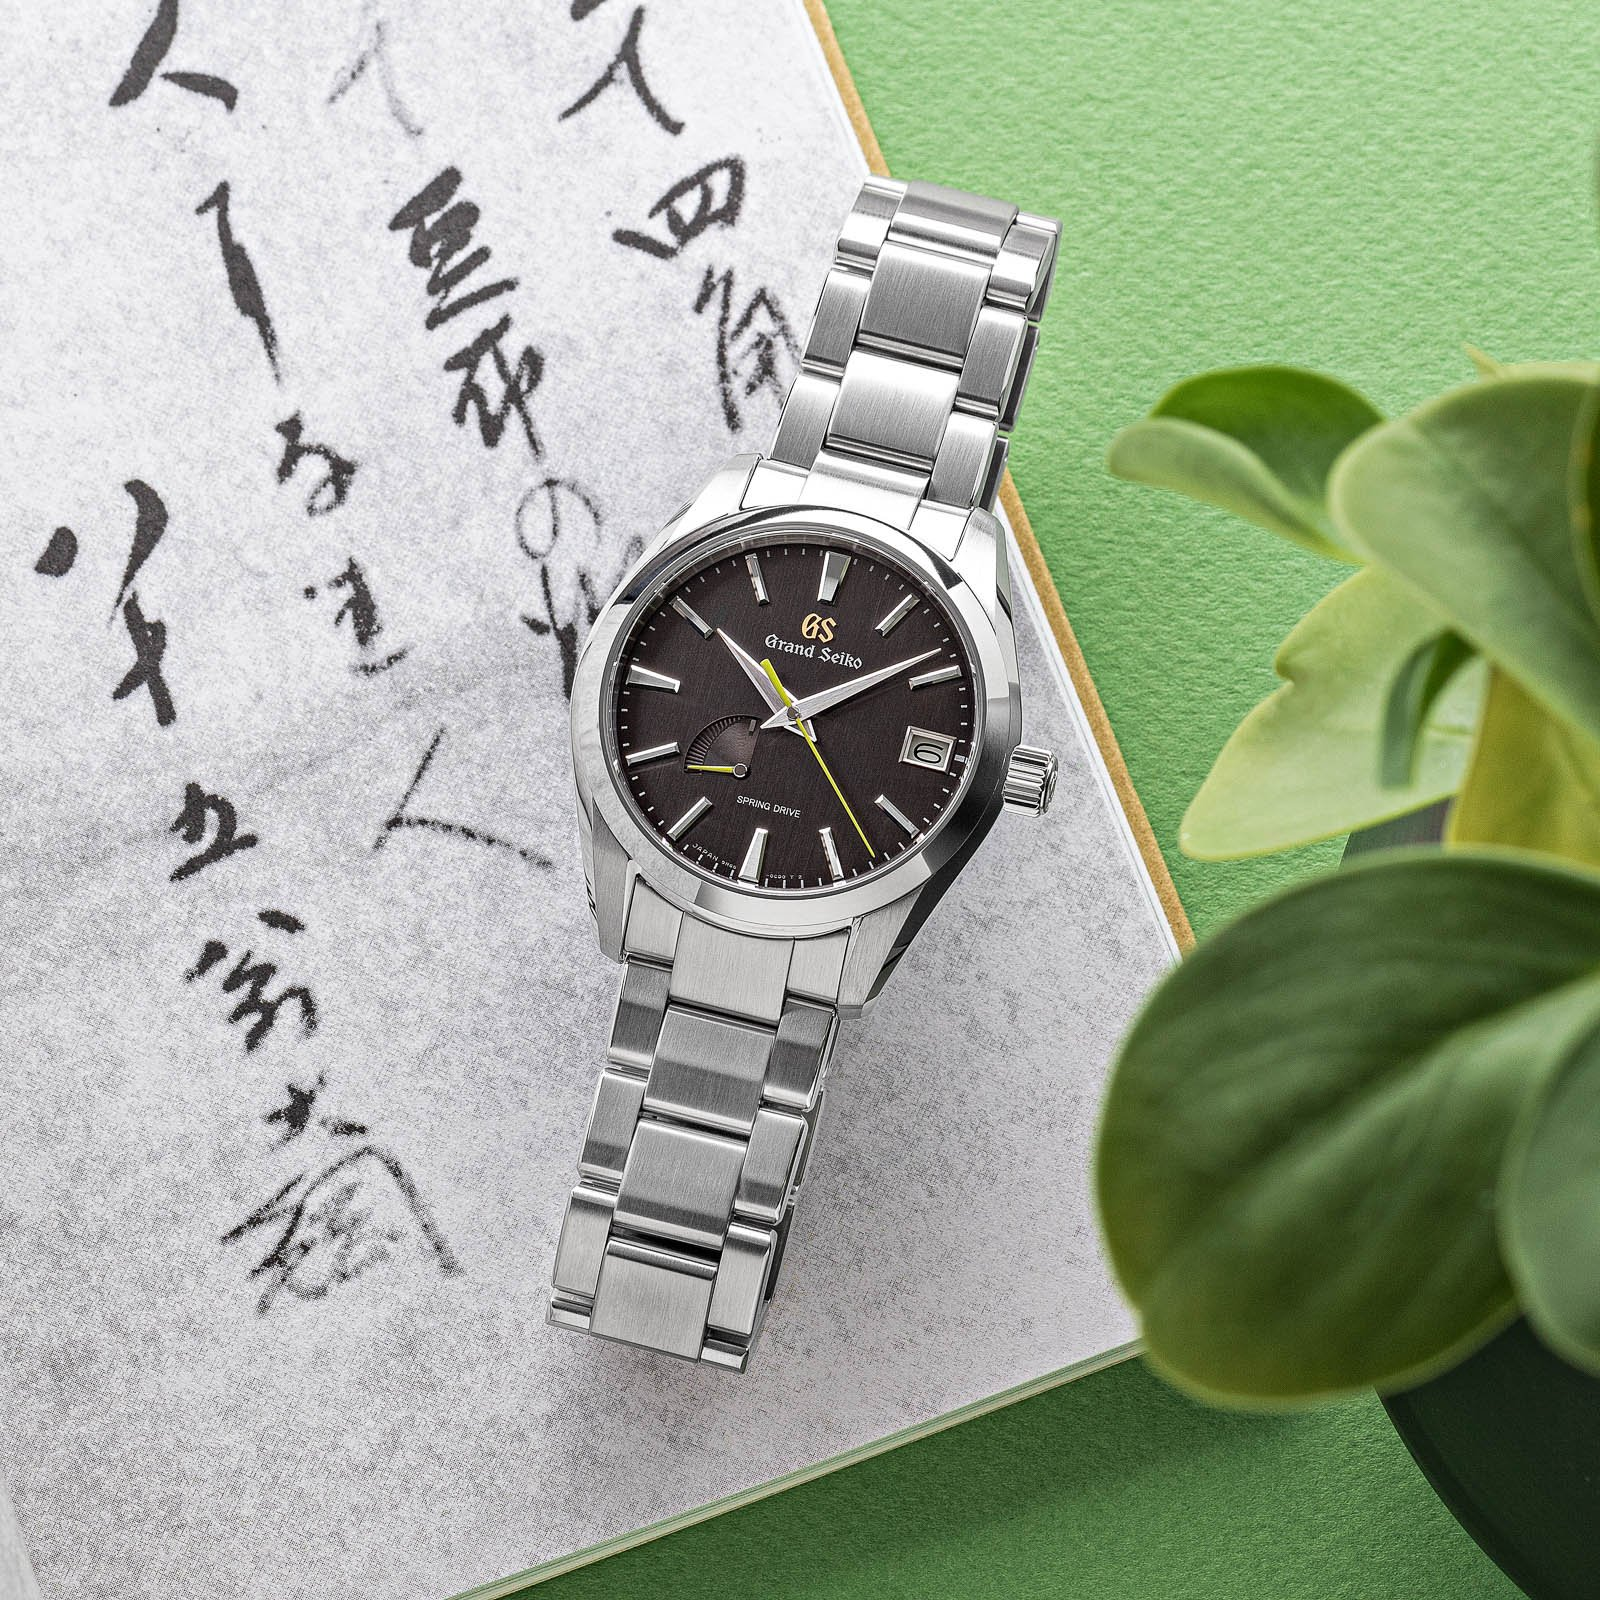 A dark dial wristwatch on a book.